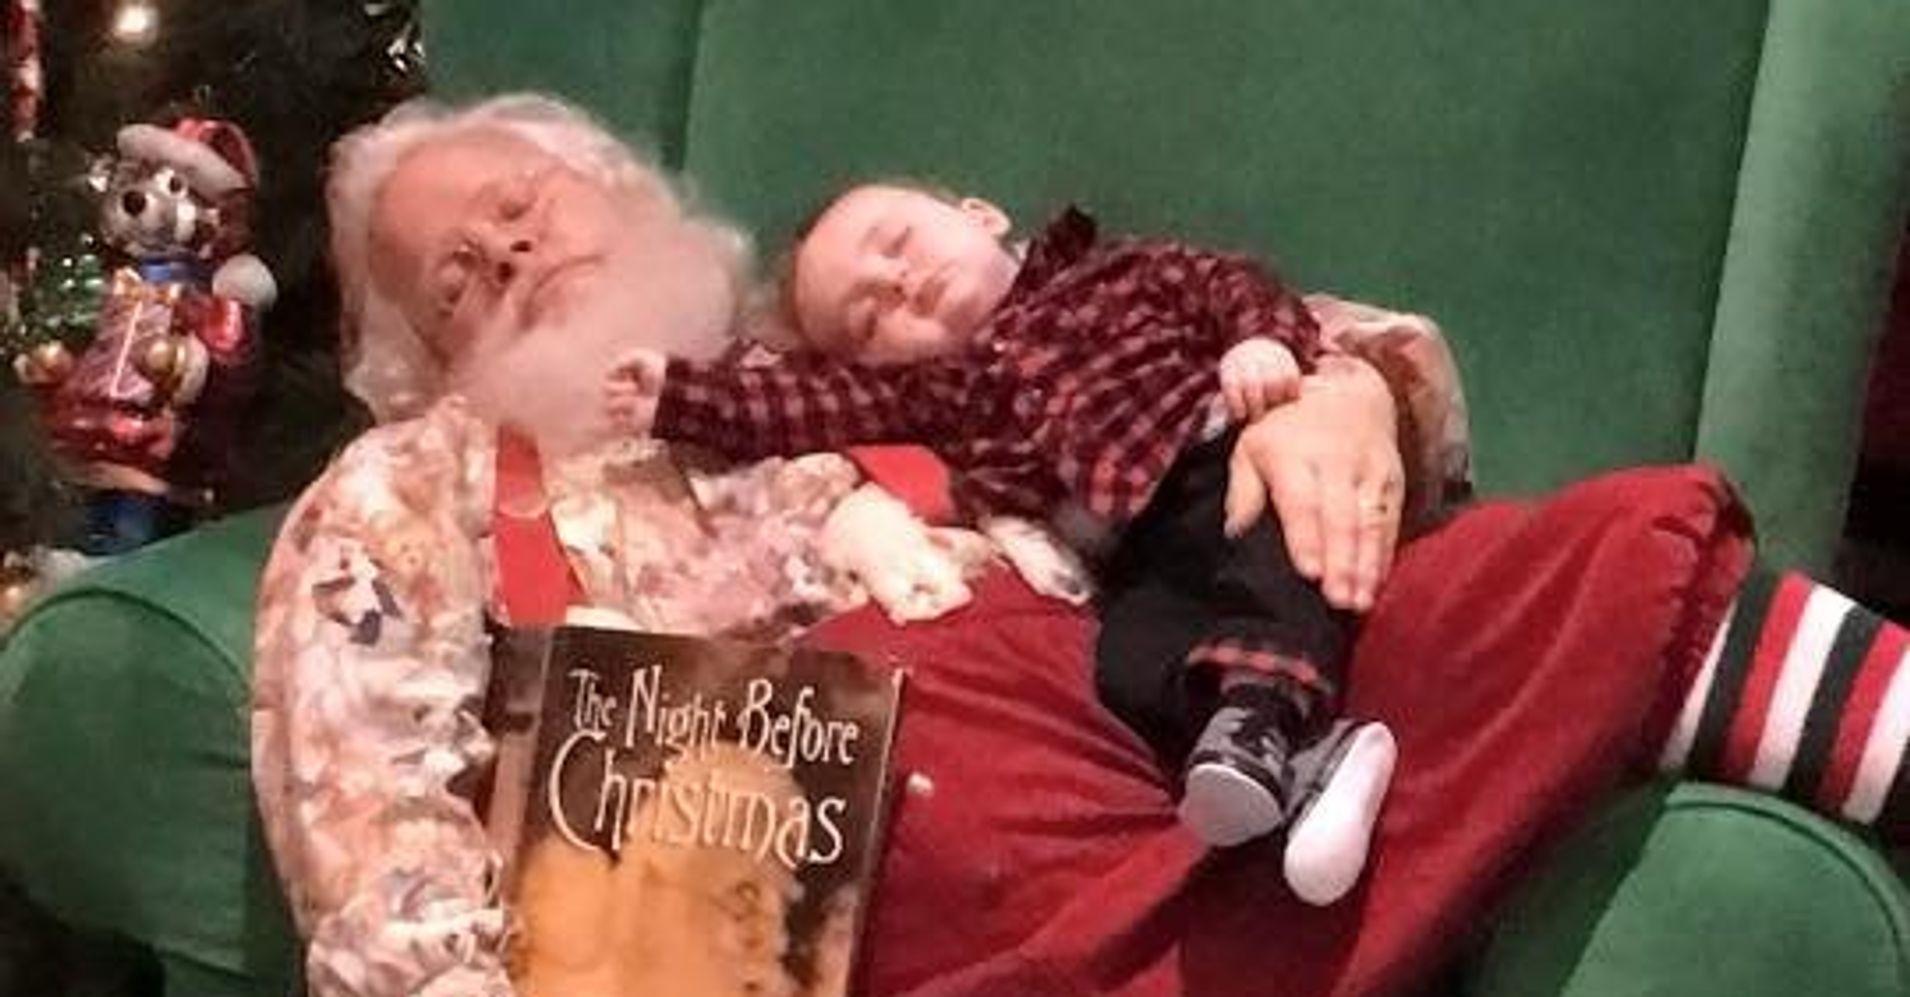 Babys sleepy photo shoot with santa will melt your heart huffpost life